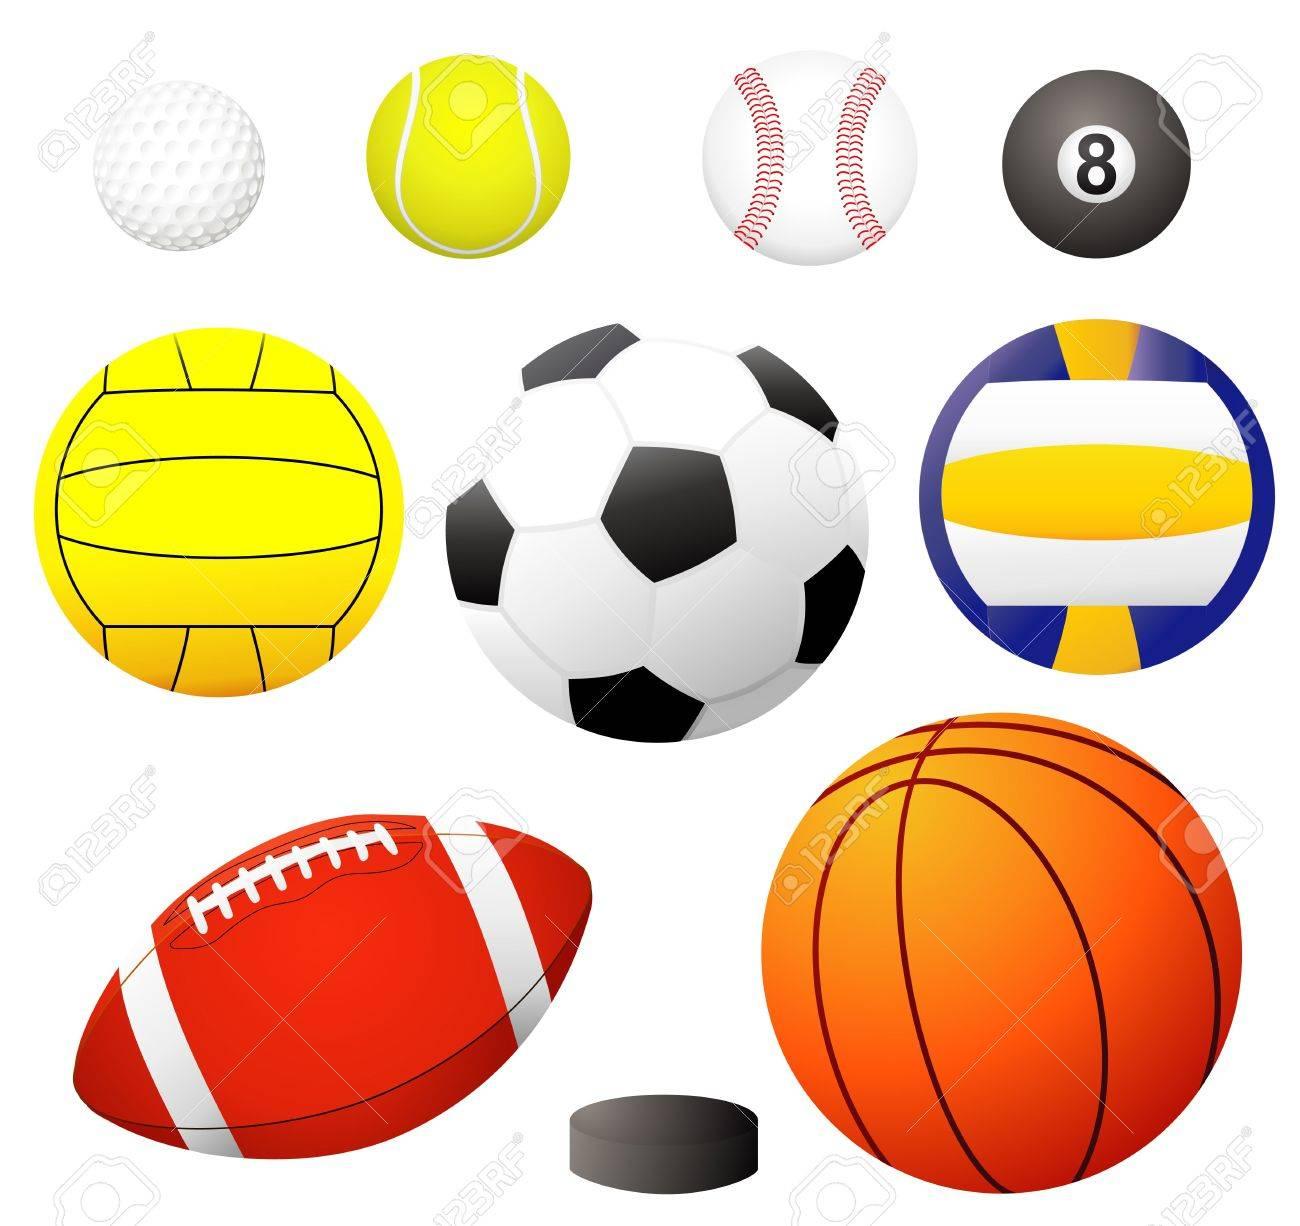 Balls - illustration! Stock Photo - 395153